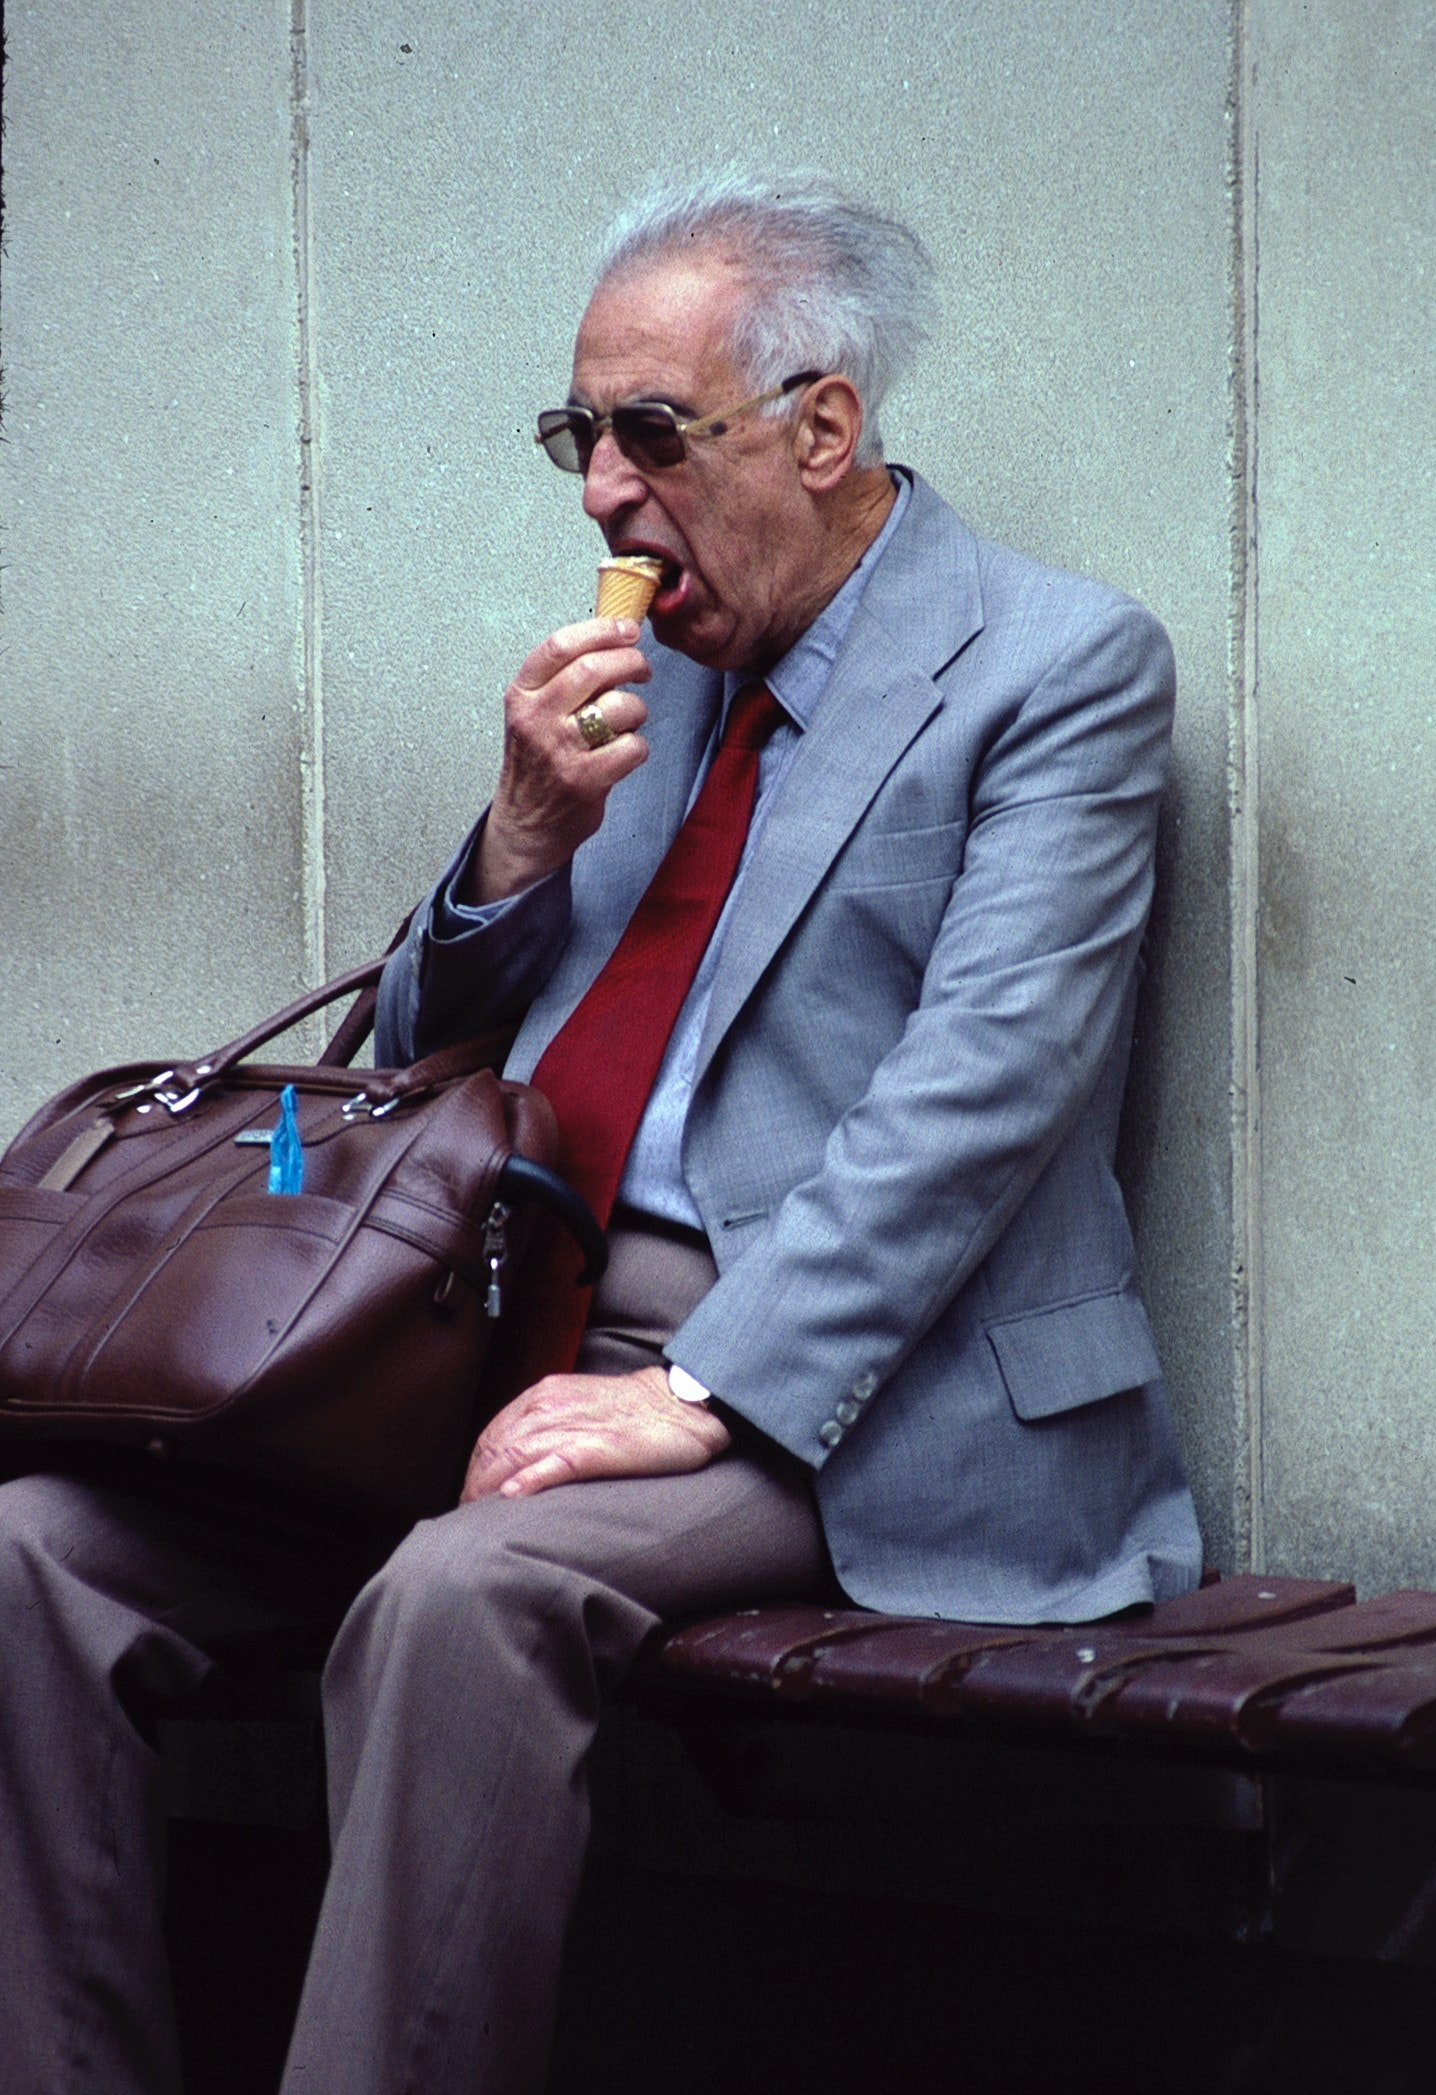 Older adult man enjoying an ice cream cone